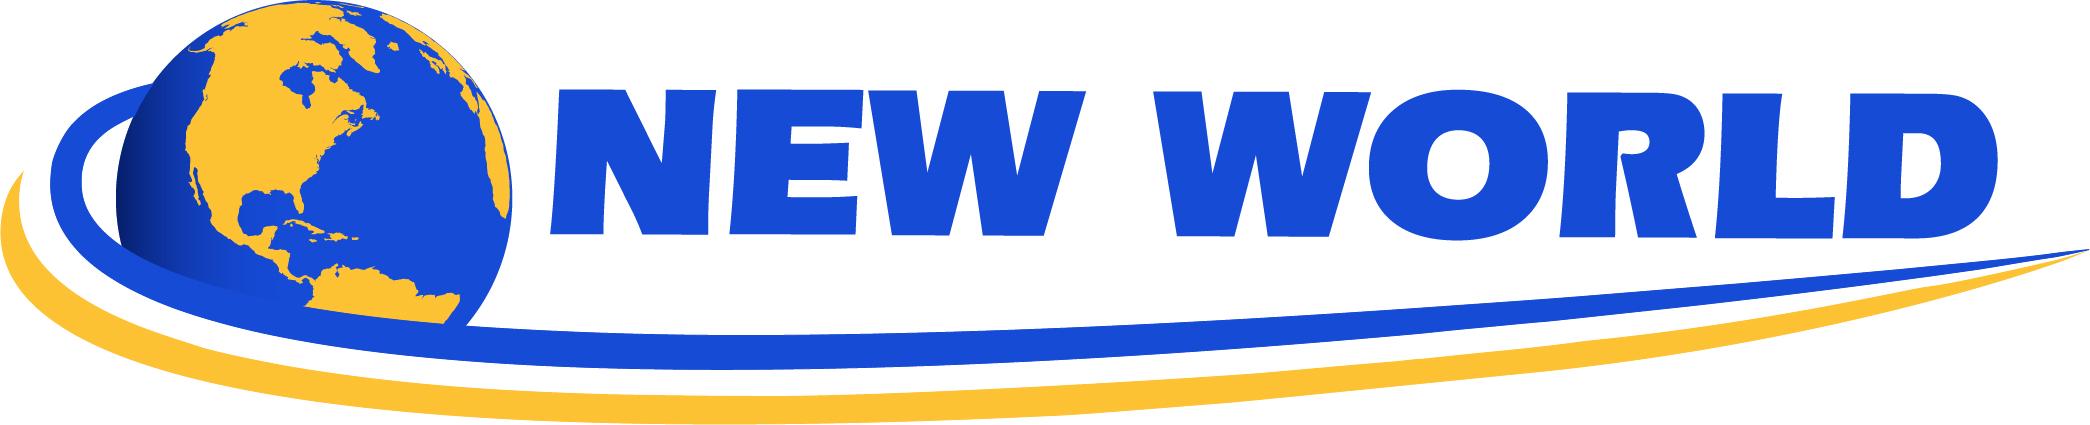 New World[133284].jpg